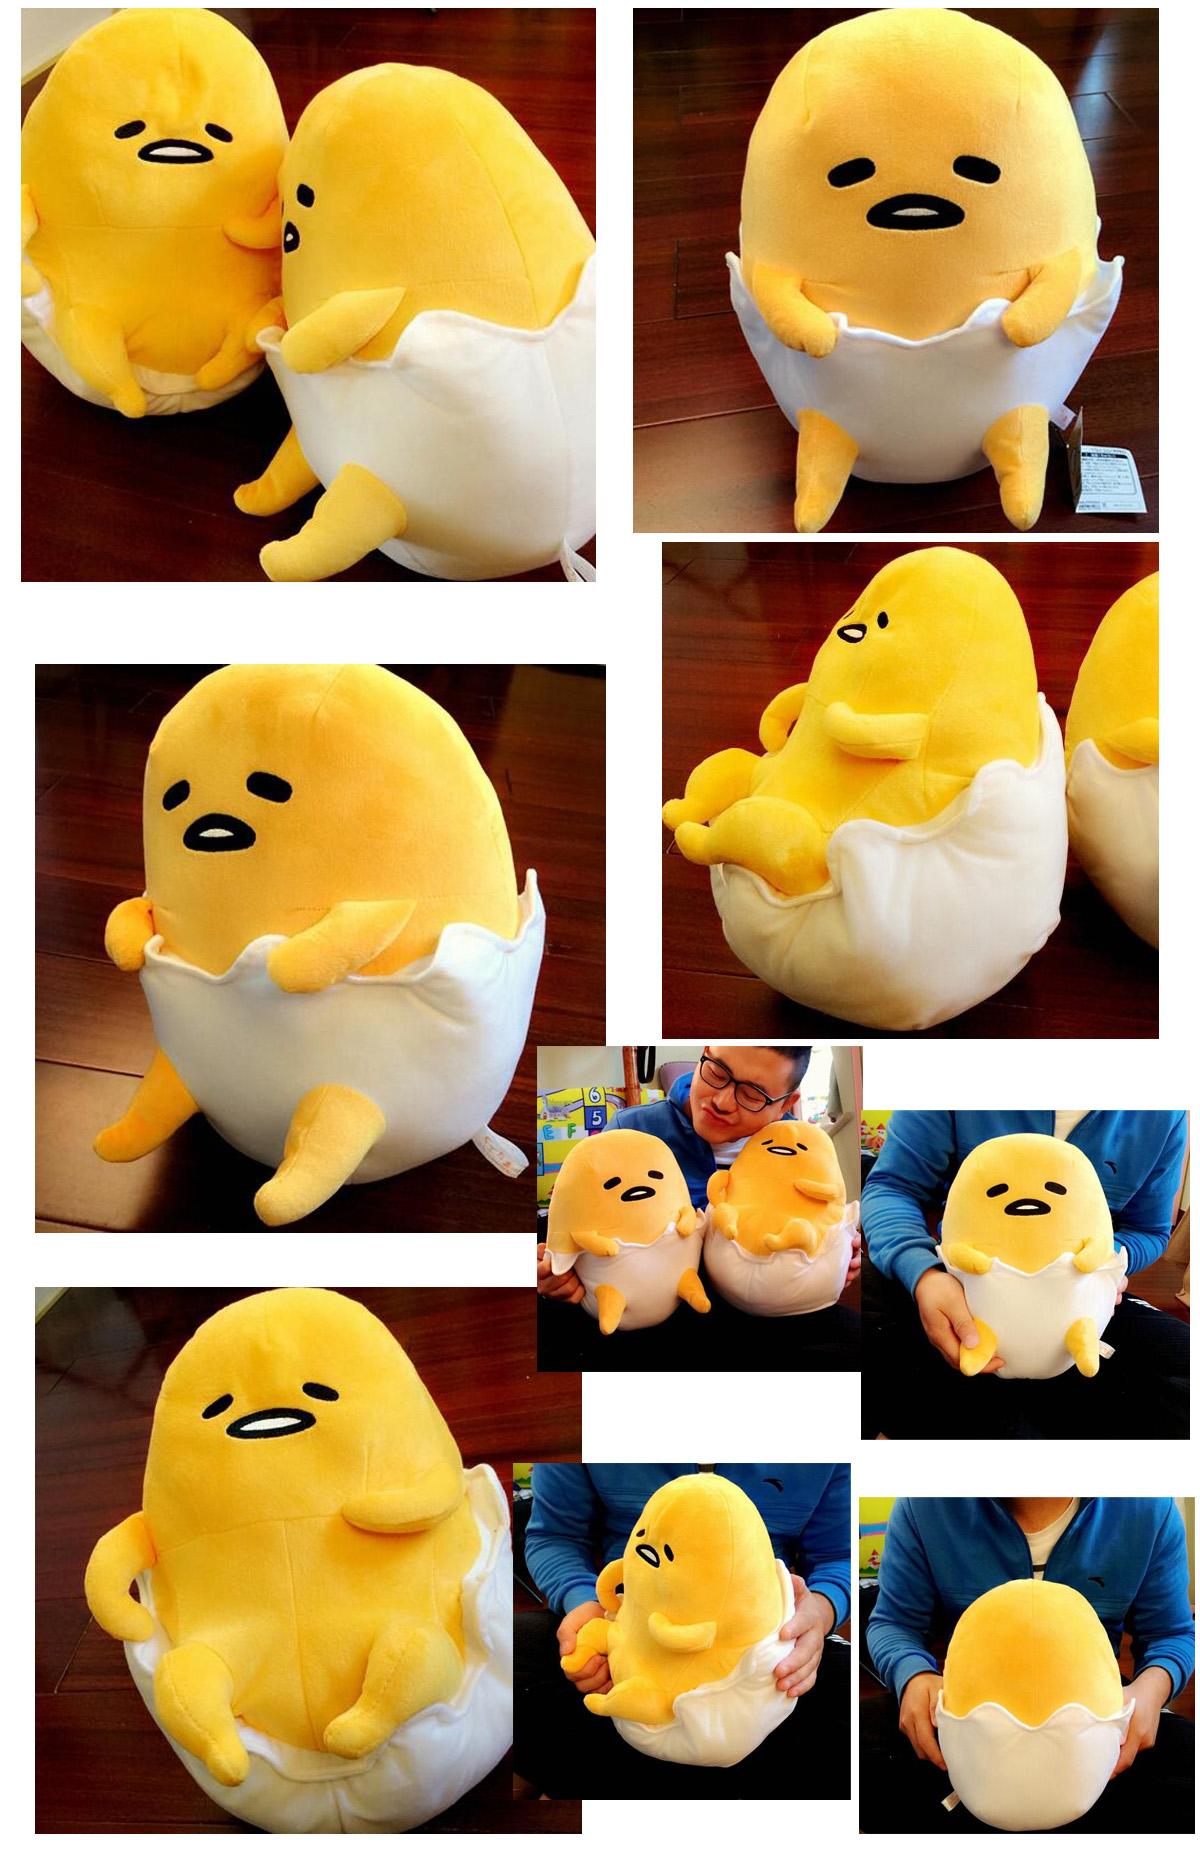 angry birds pig pikachu - photo #15